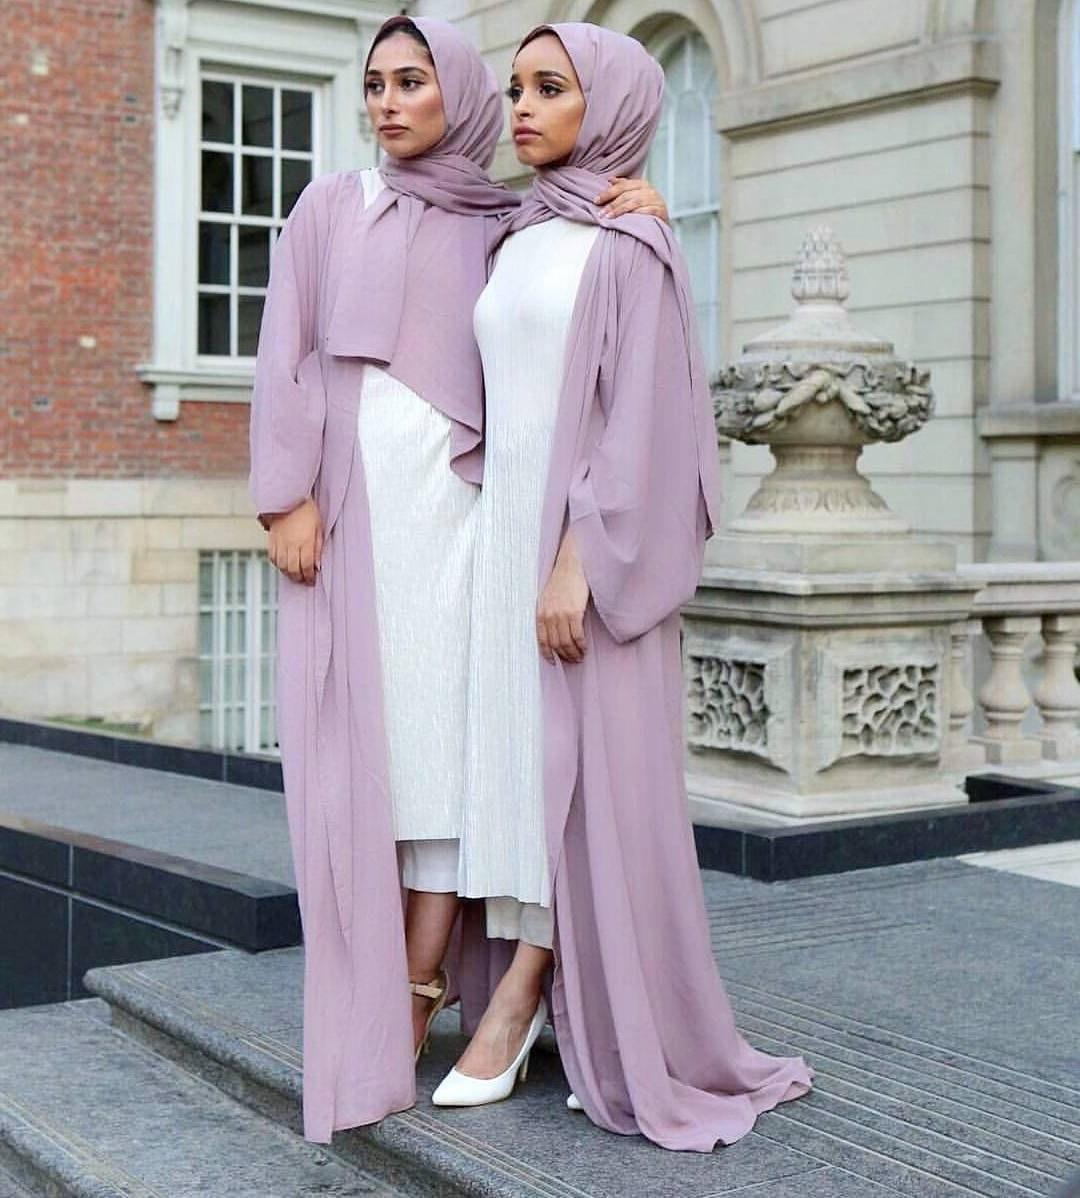 Bentuk Baju Lebaran Thn 2018 8ydm 50 Model Baju Lebaran Terbaru 2018 Modern & Elegan